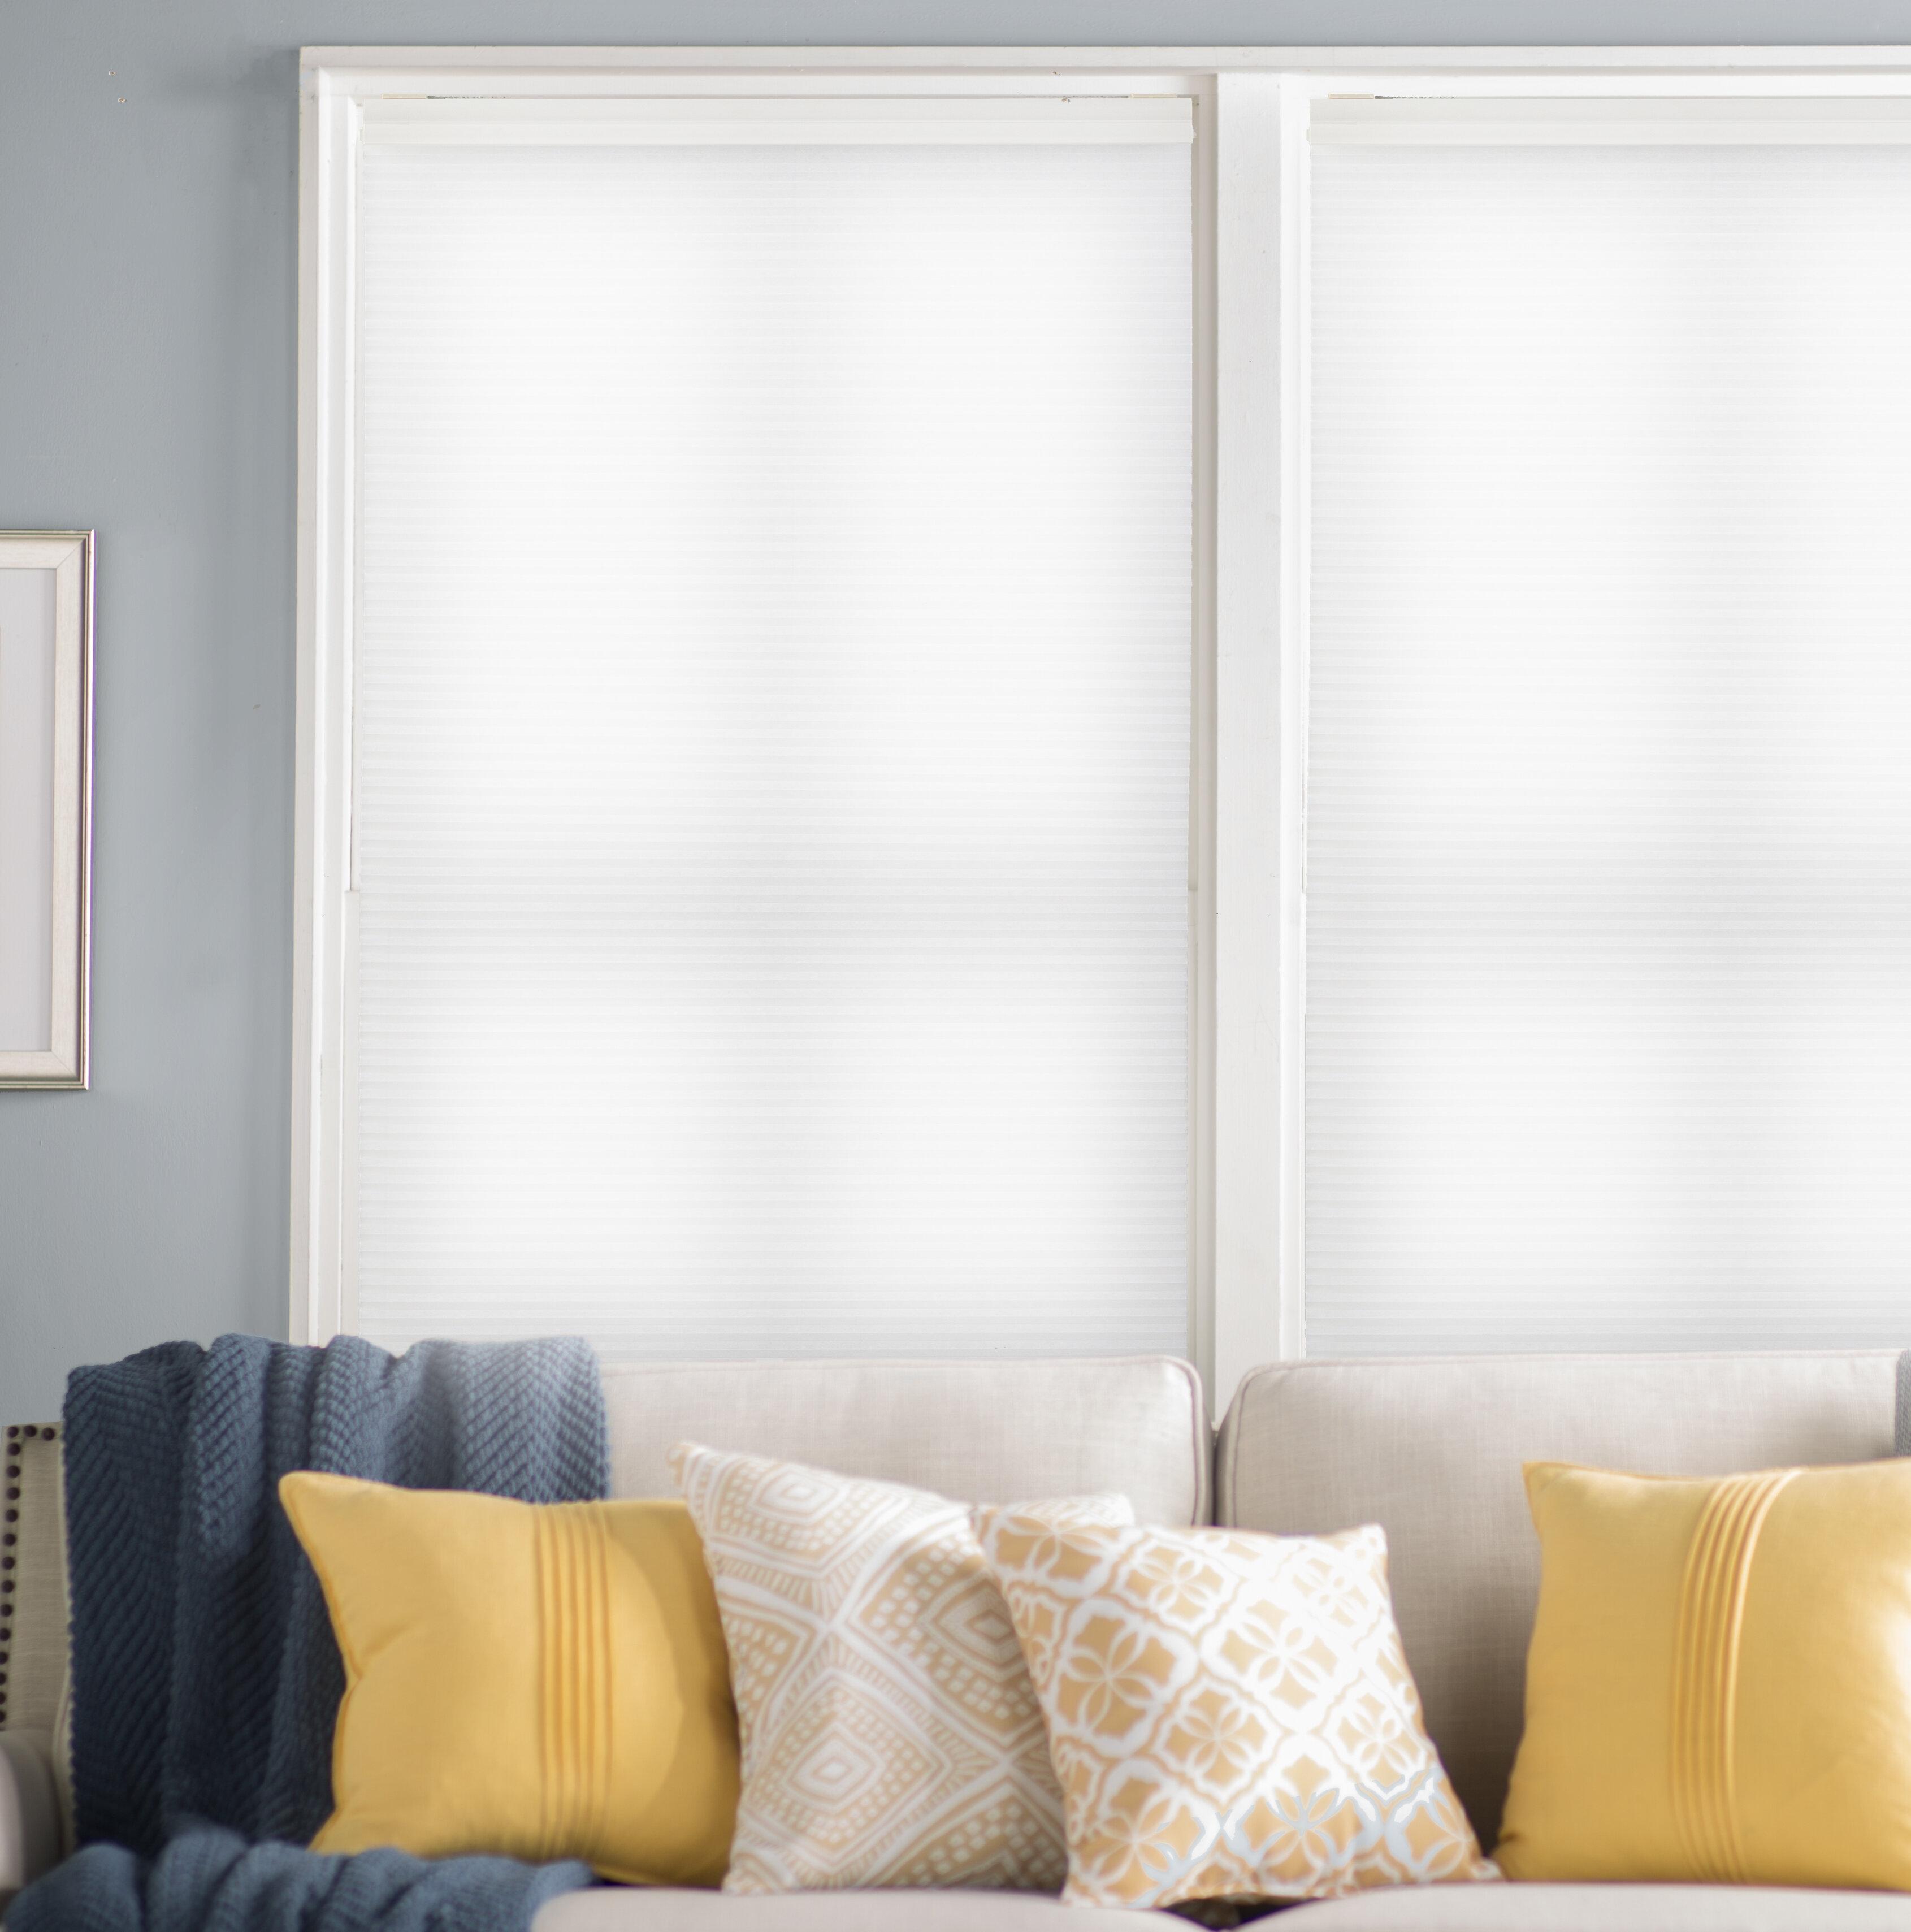 Decor Avenue Custom Cordless 18 1//2 W x 30 to 36 H Crystal Light Filtering Cellular Shade Inside Mount